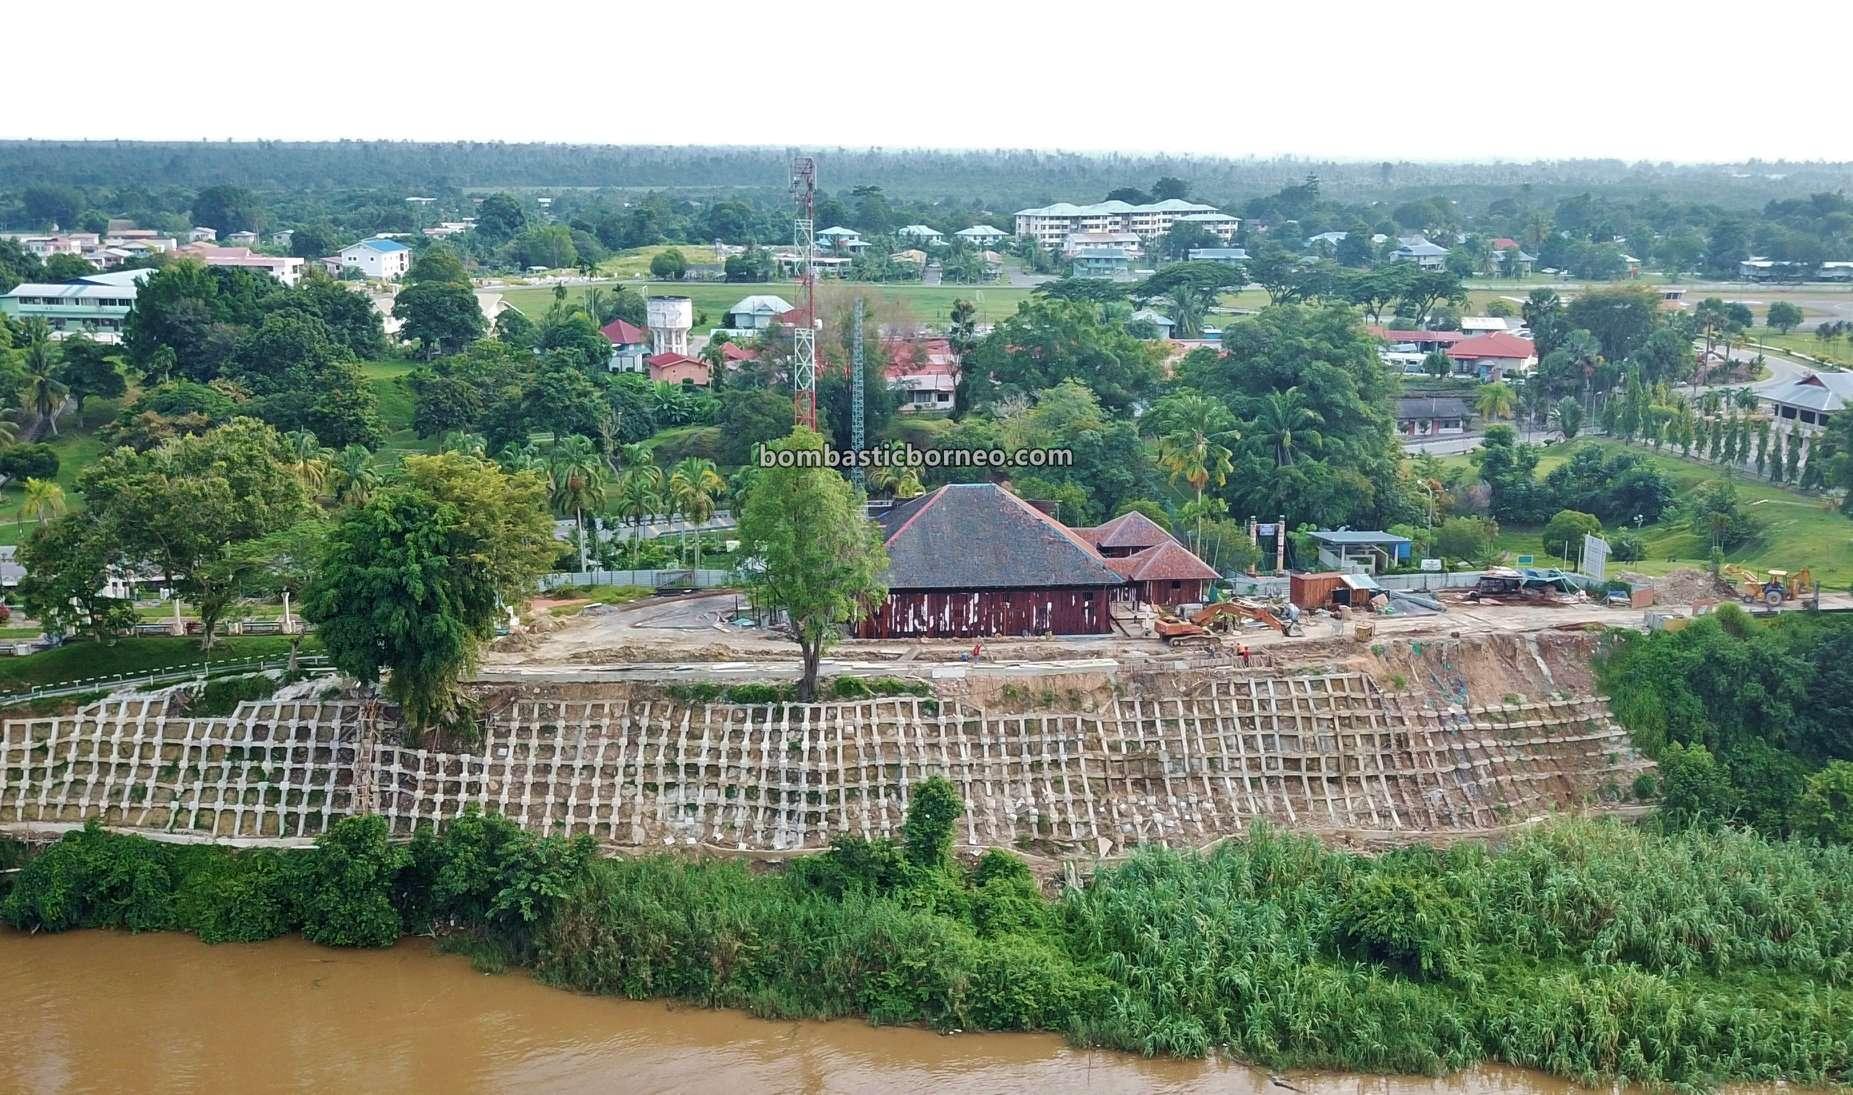 backpackers, Destination, exploration, museum, Sungai Baram, river, Miri, town, Tourism, tourist attraction, travel guide, Trans Borneo, 马来西亚砂拉越, 马鲁帝博物院